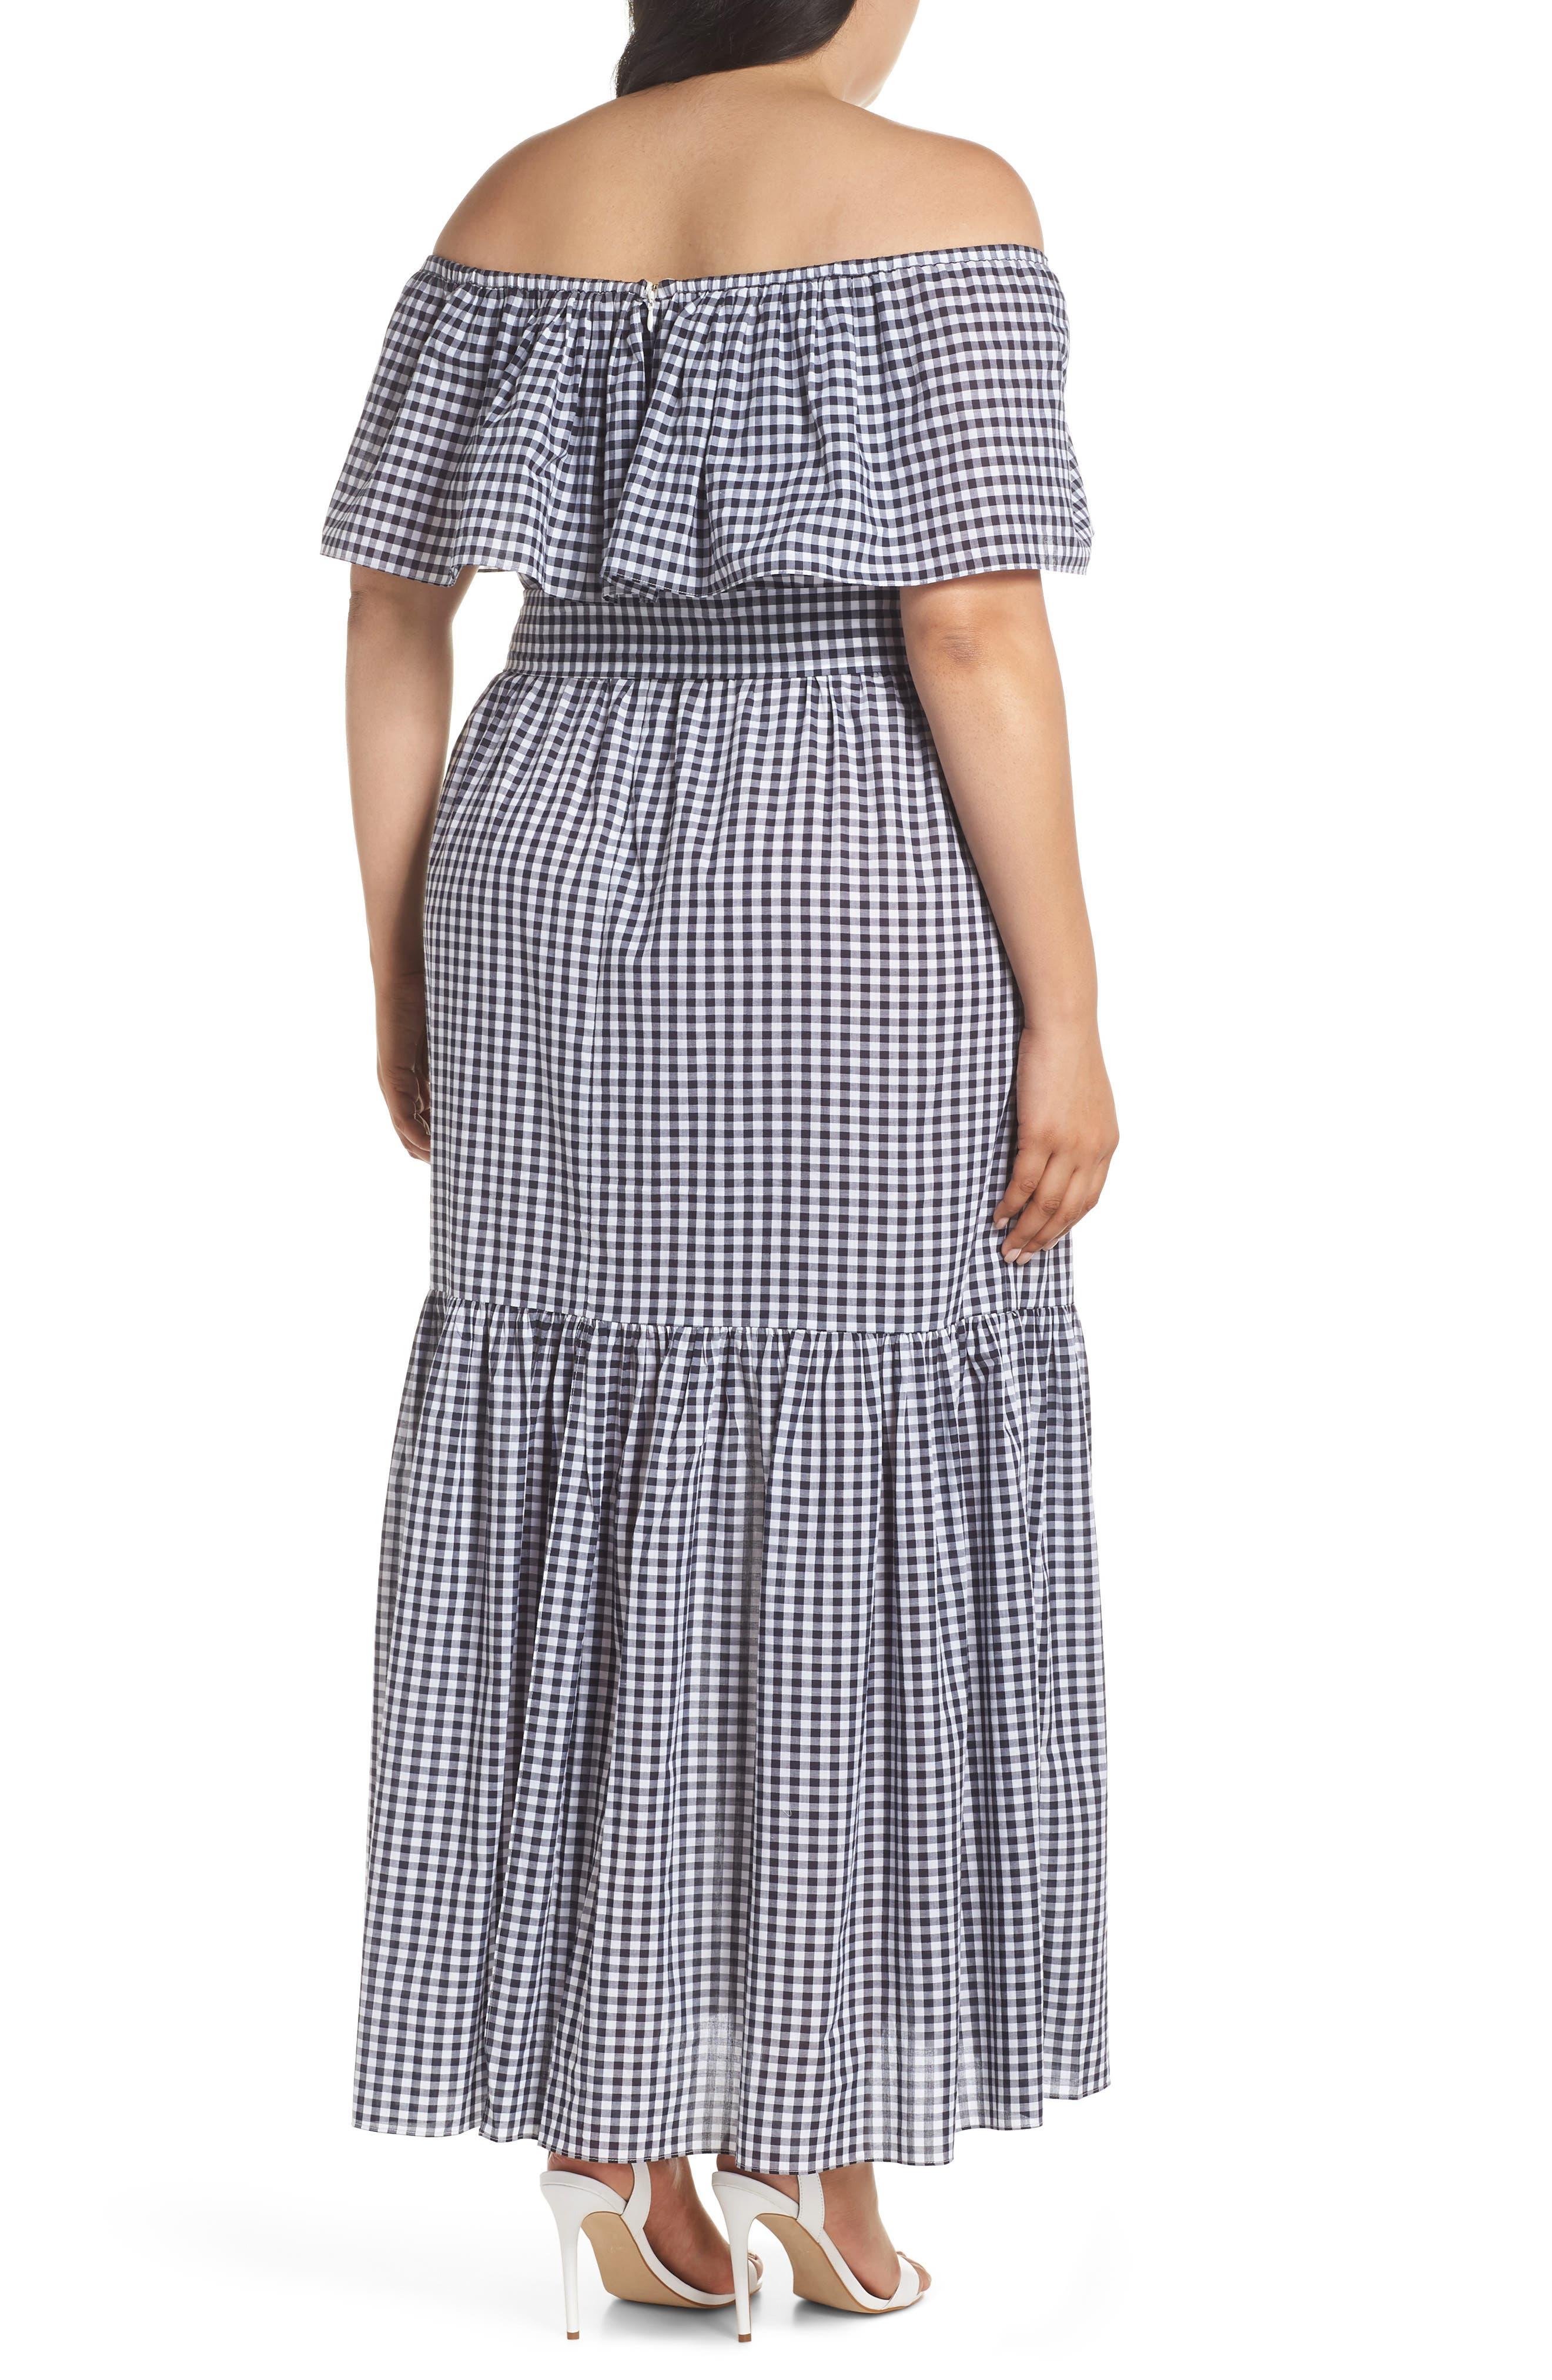 Off the Shoulder Gingham Maxi Dress,                             Alternate thumbnail 2, color,                             Blue White Gingham